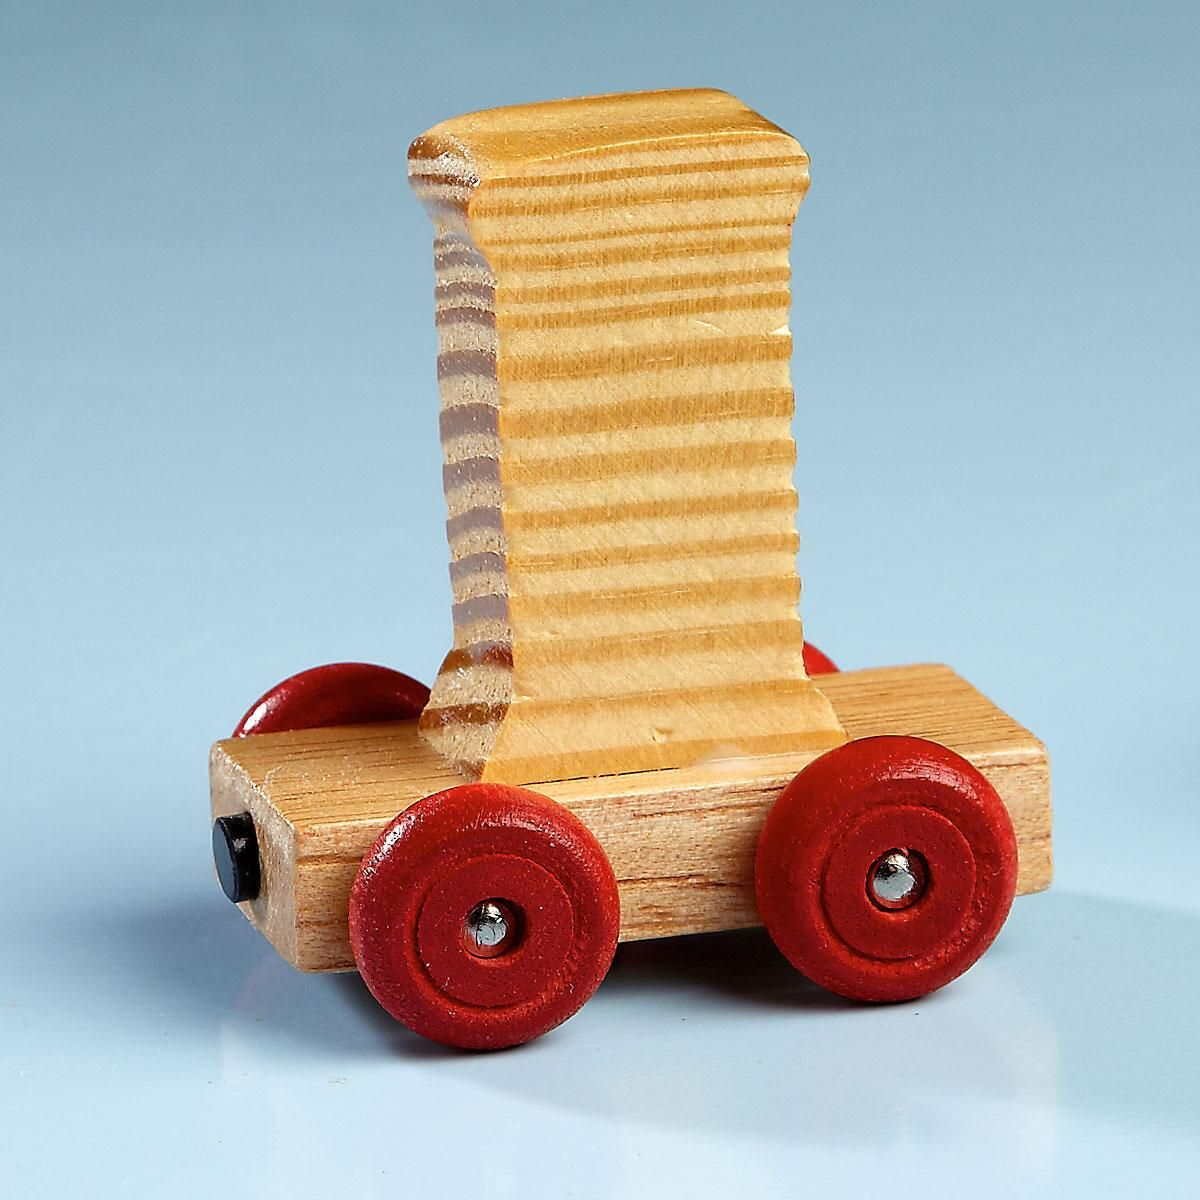 Letter Car - I